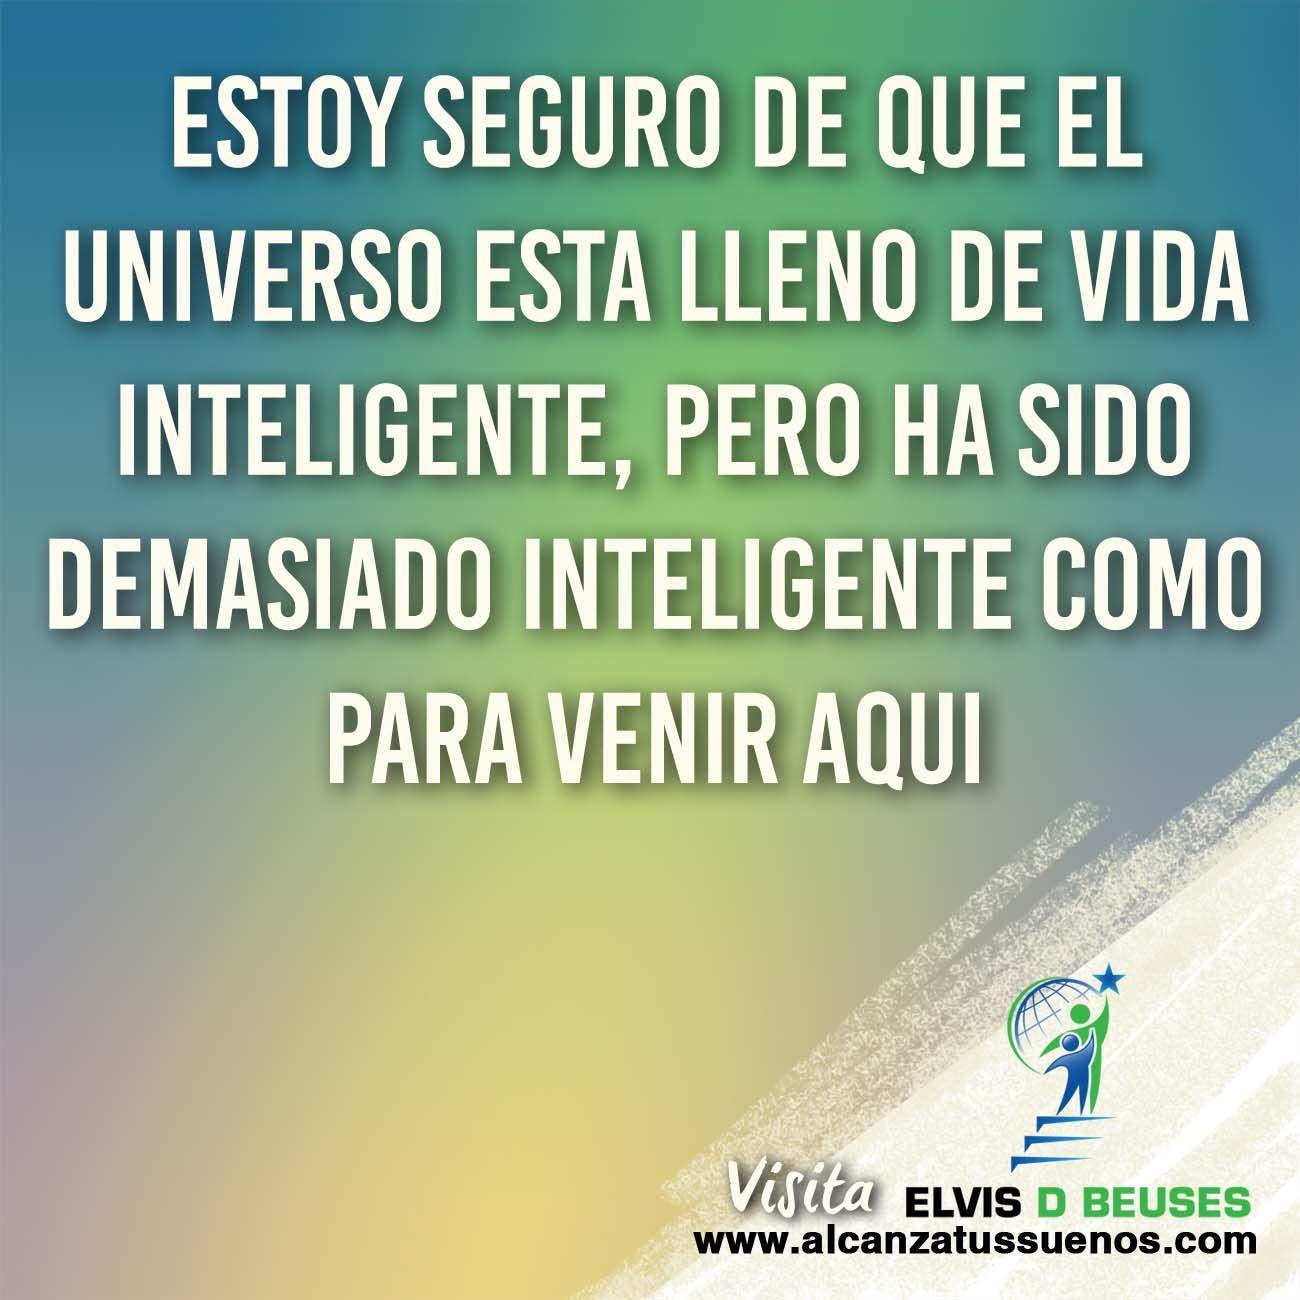 visita http://www.alcanzatussuenos.com  #reflexion #vivir #metas #inspiracion…